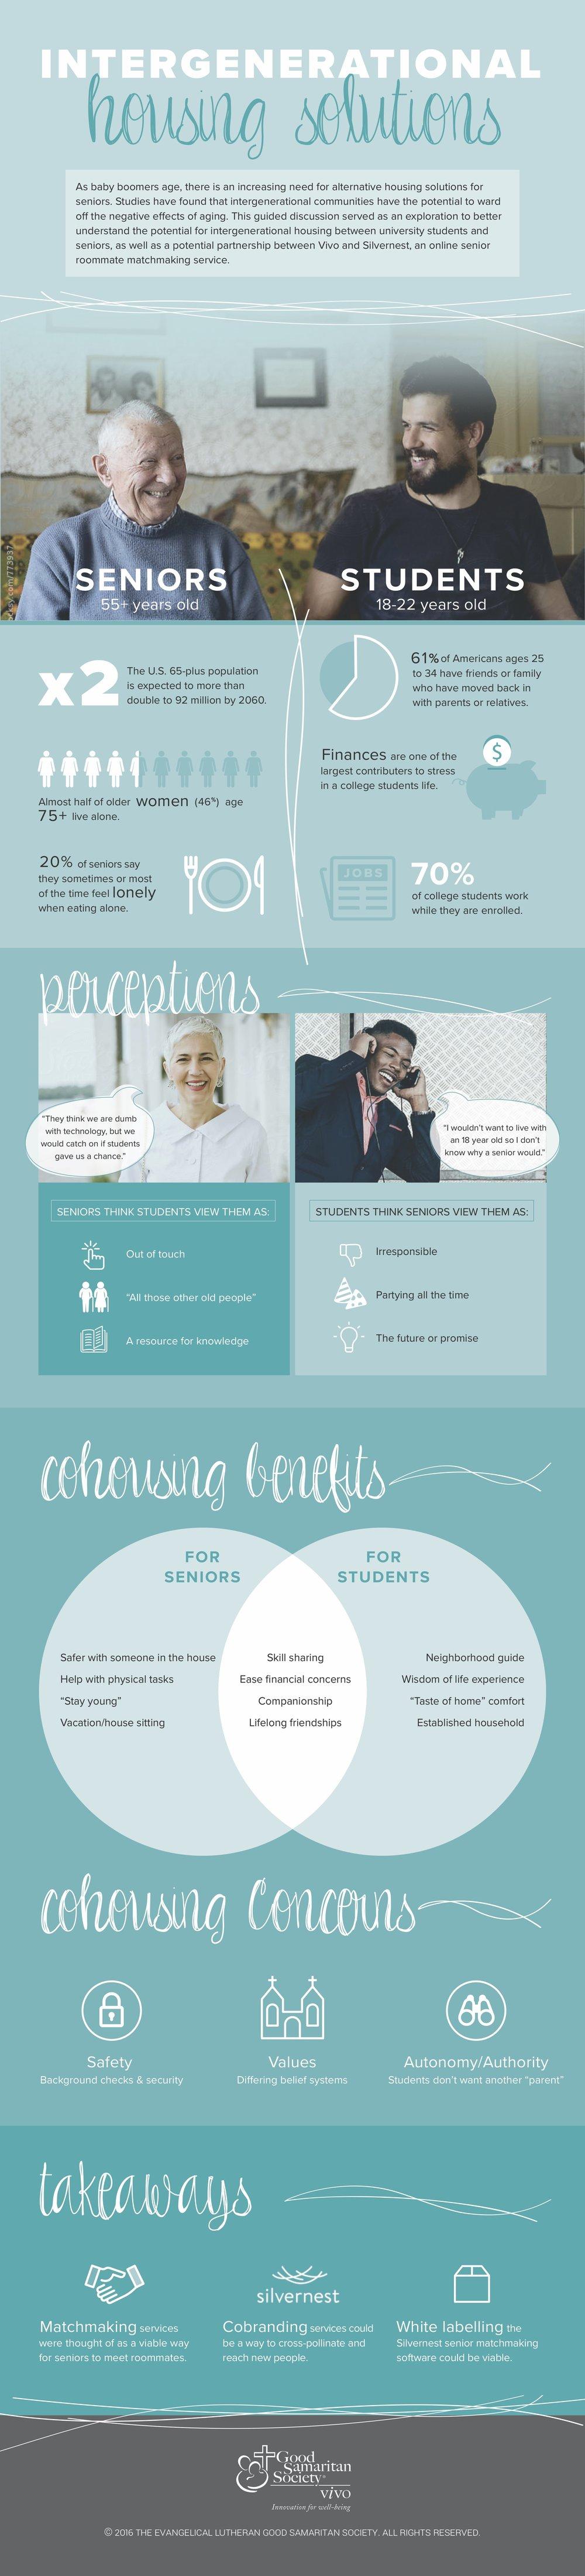 Vivo_Silvernest_Infographic_3.jpg